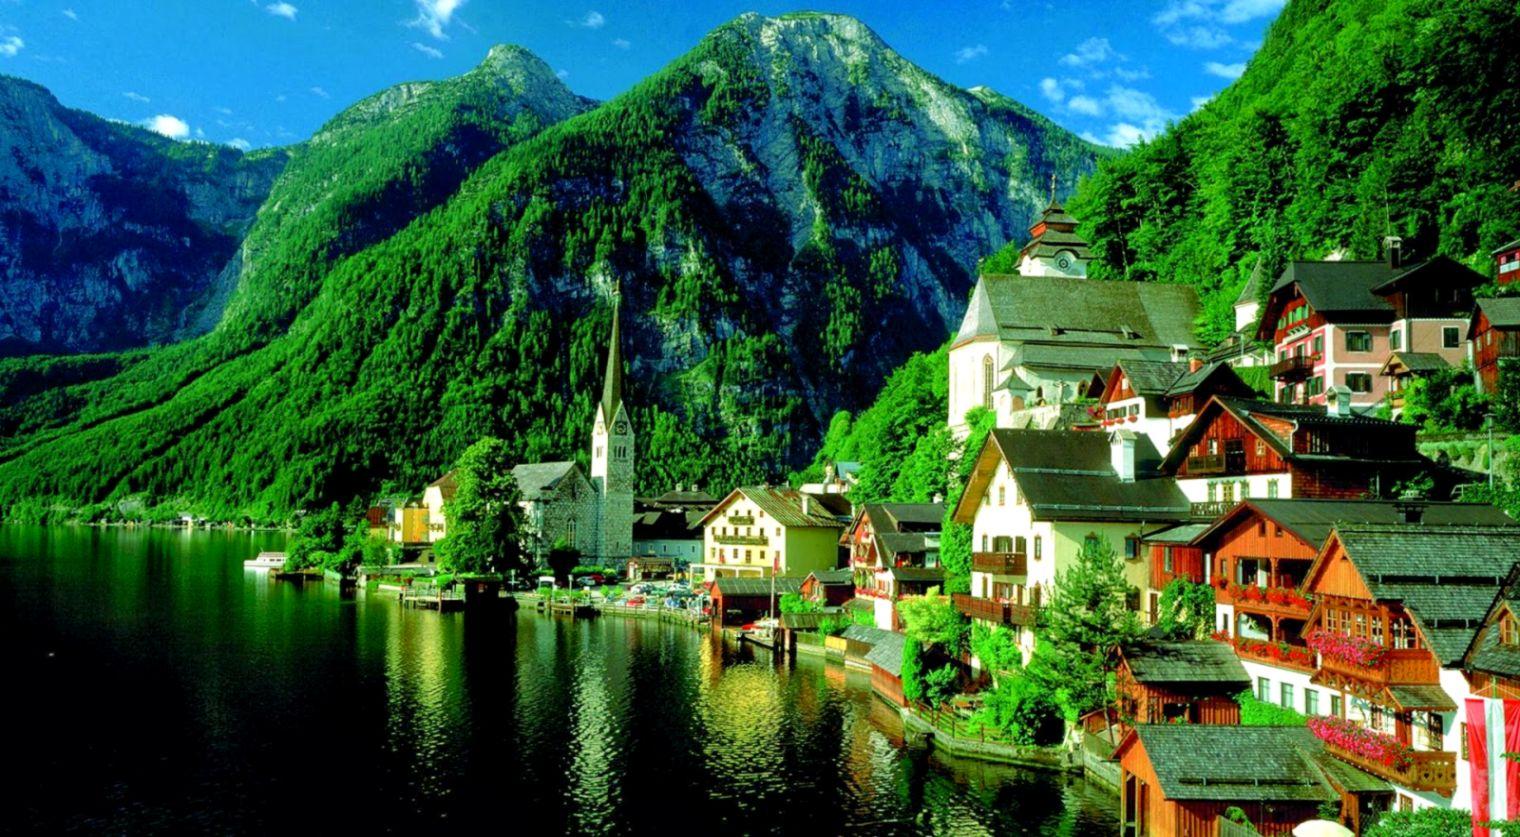 beautiful views of nature wallpaper | image wallpapers hd